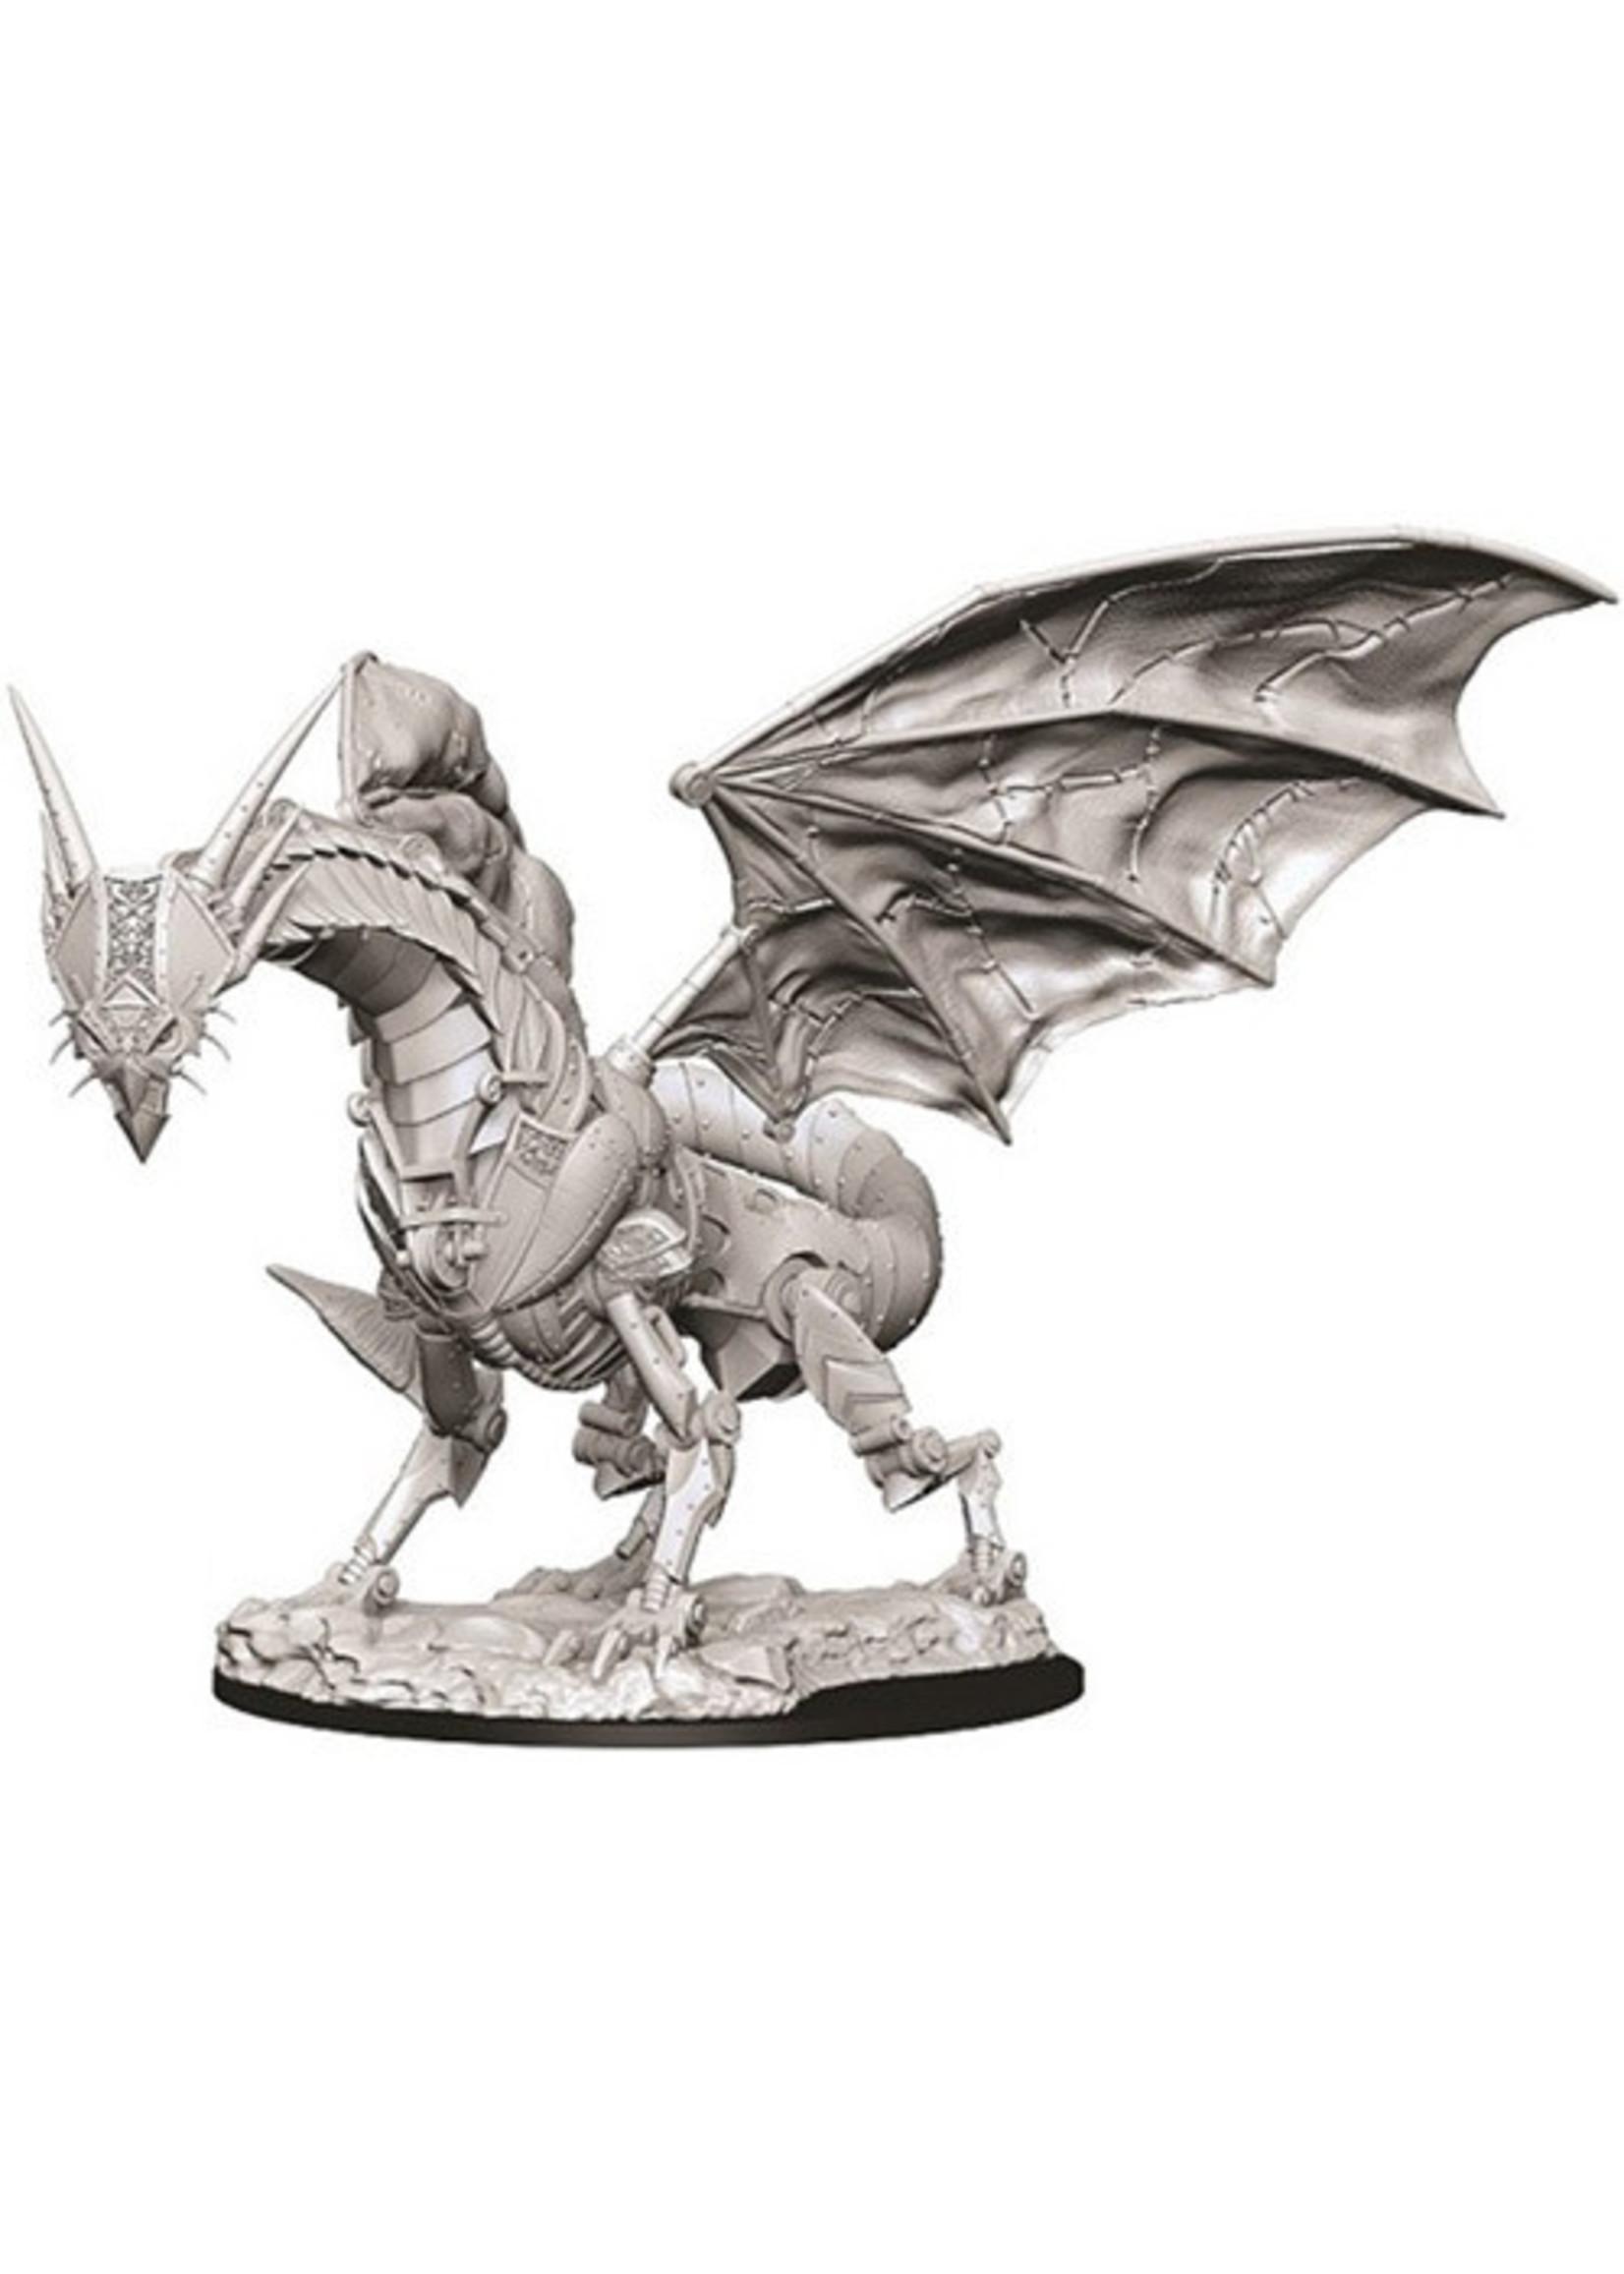 Pathfinder Deep Cuts Unpainted Miniatures: W9 Clockwork Dragon